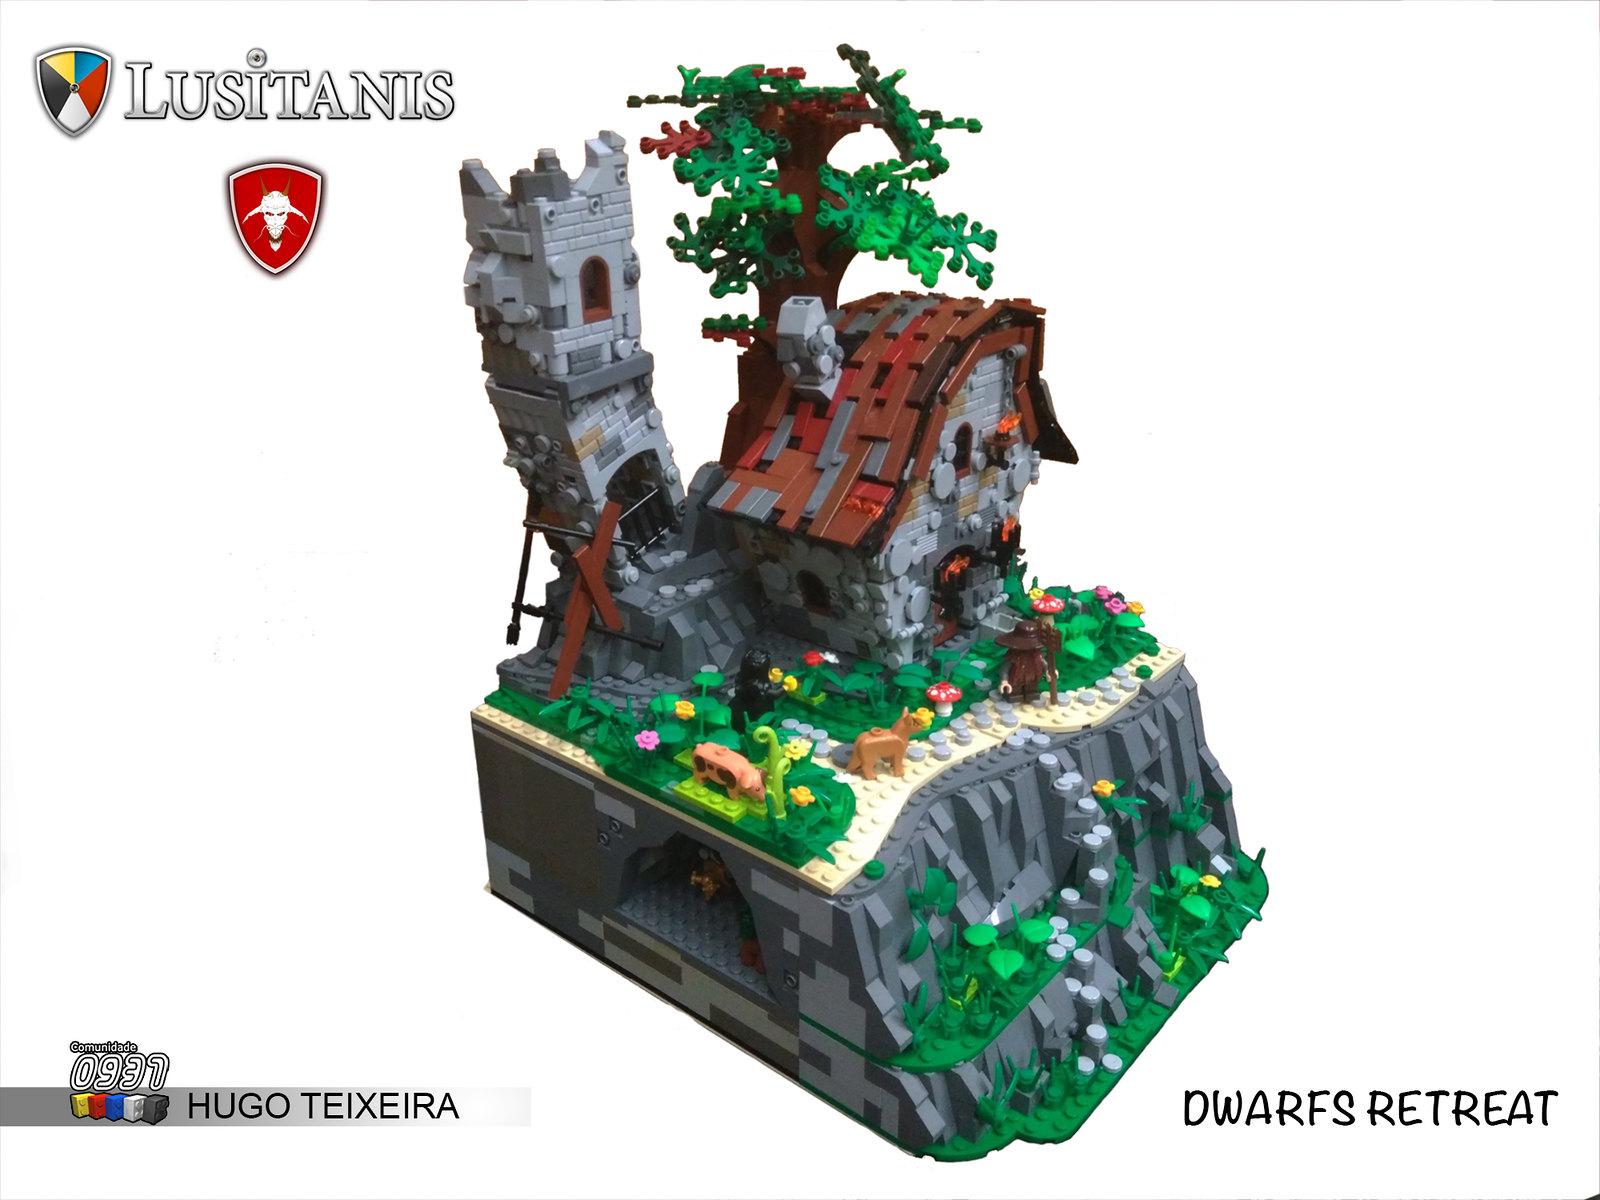 Dwarfs retreat 2